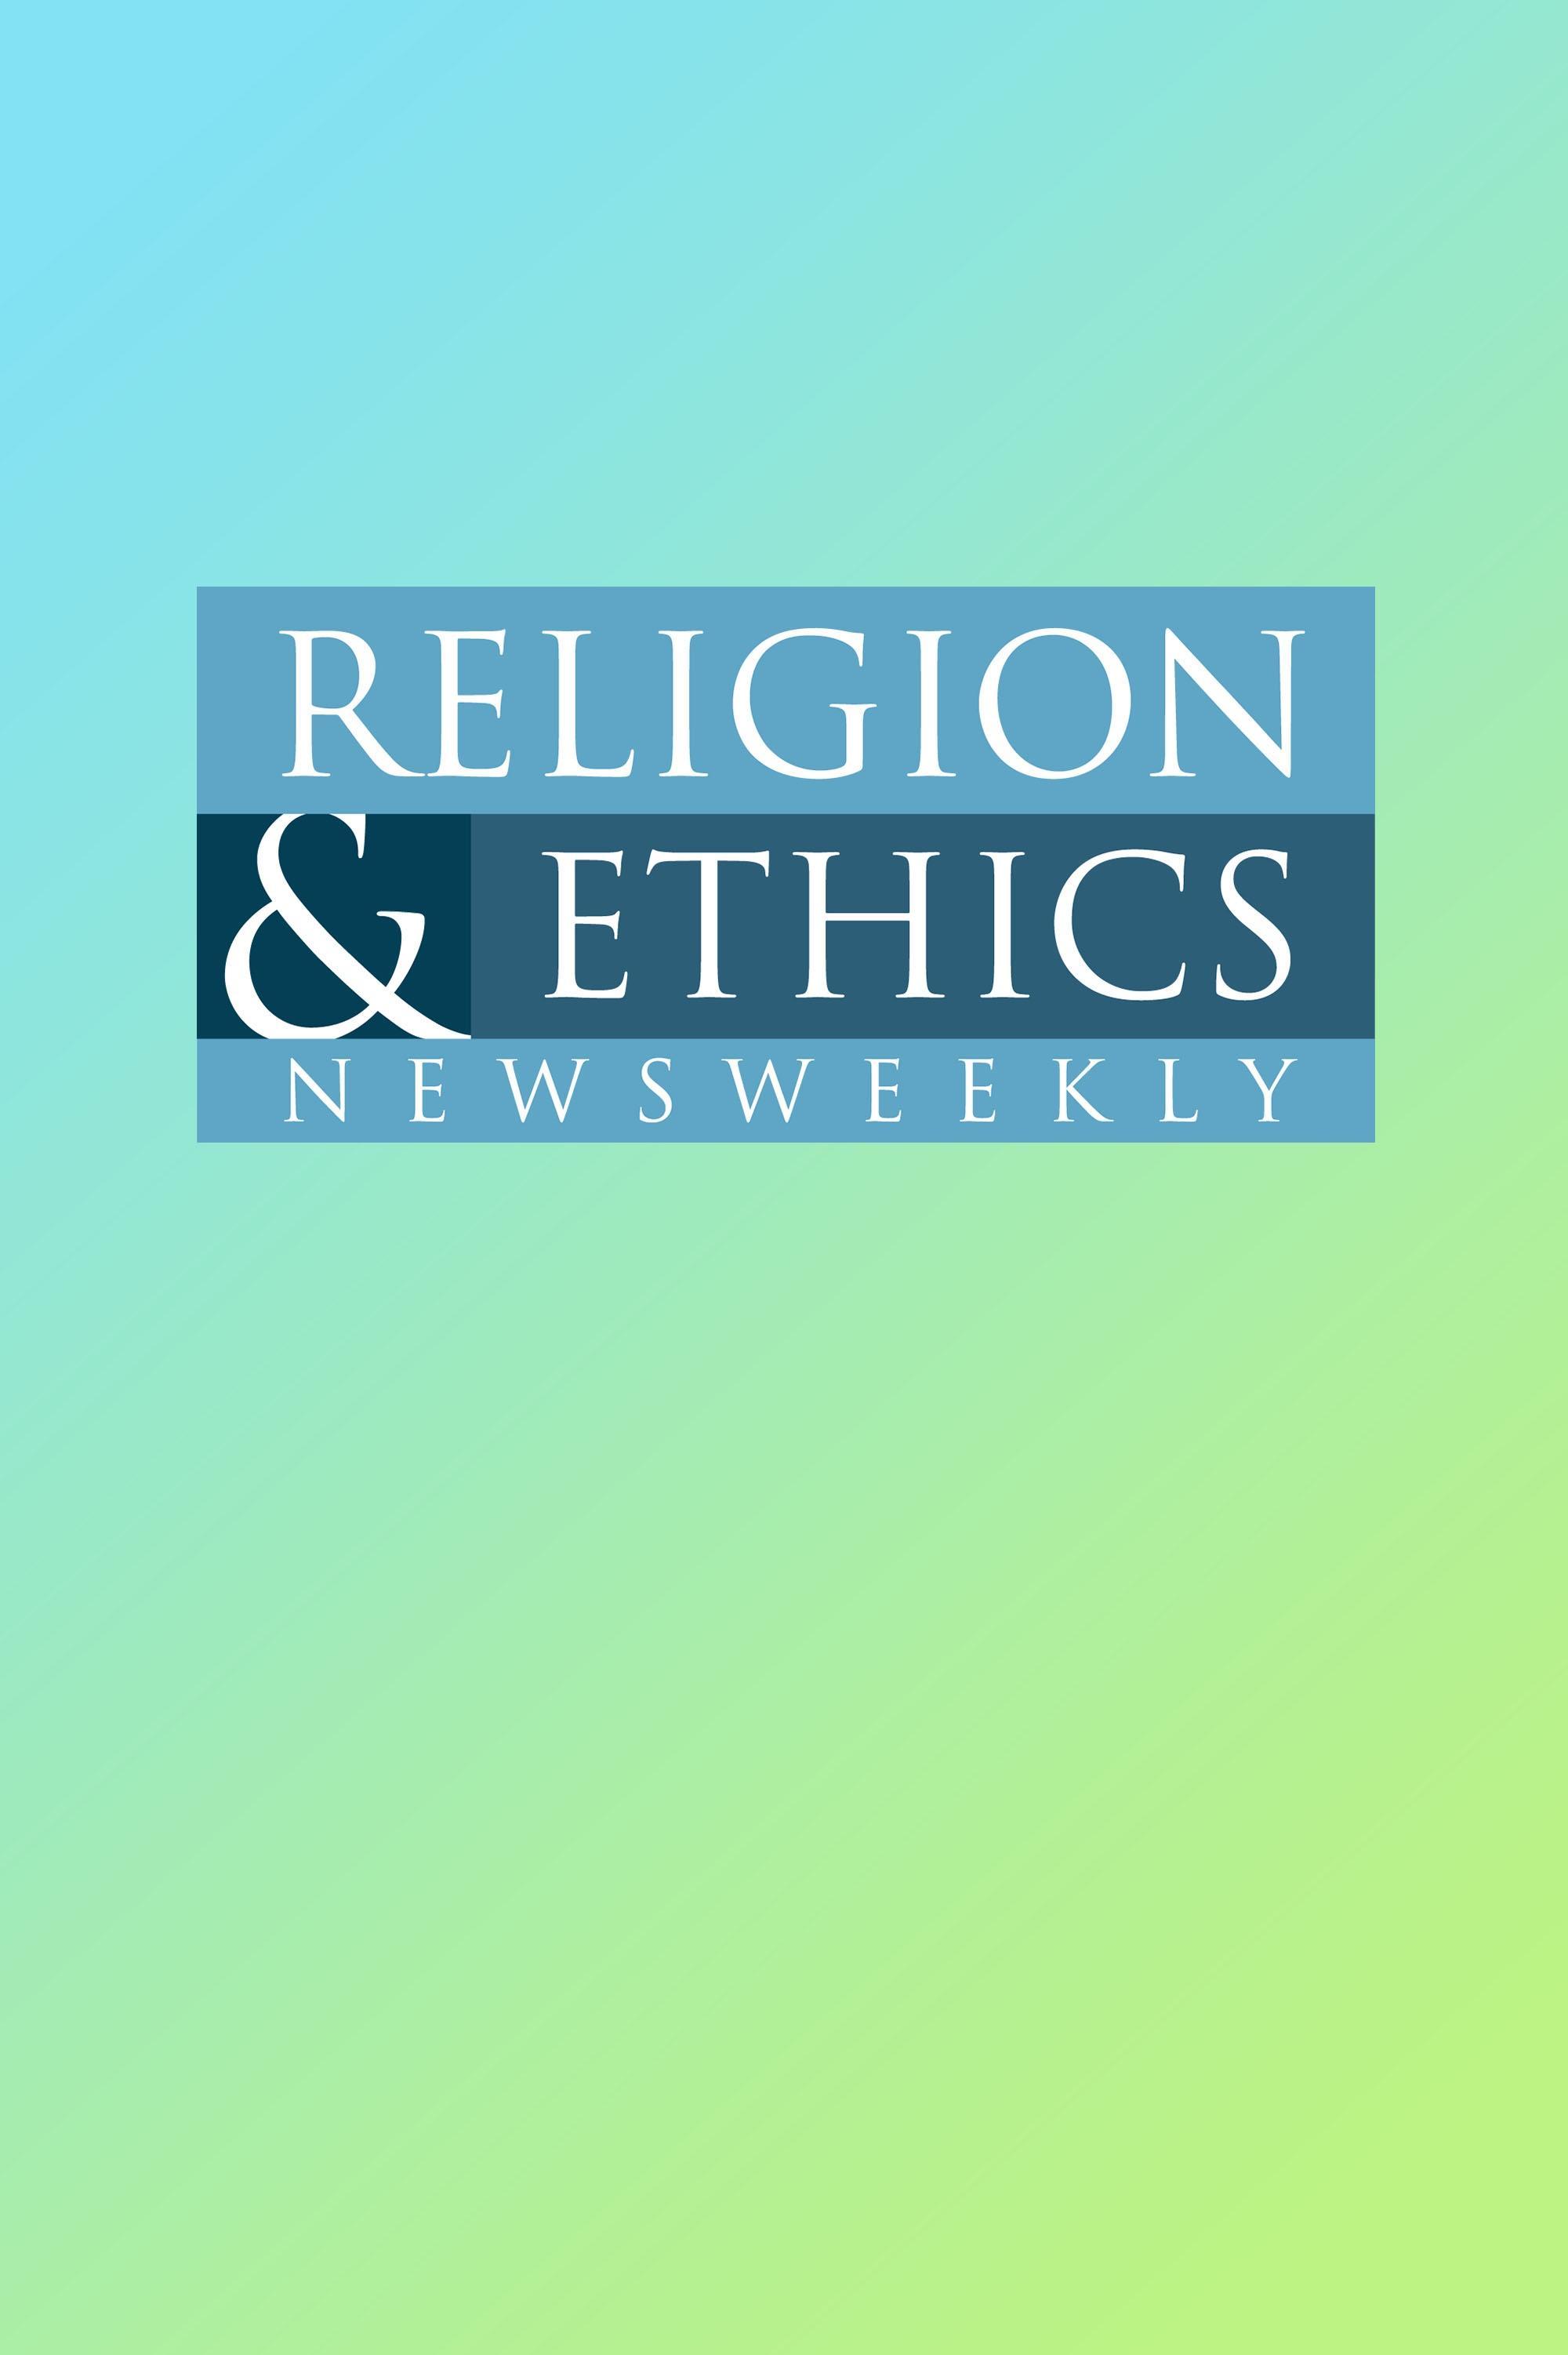 Religion & Ethics NewsWeekly on FREECABLE TV